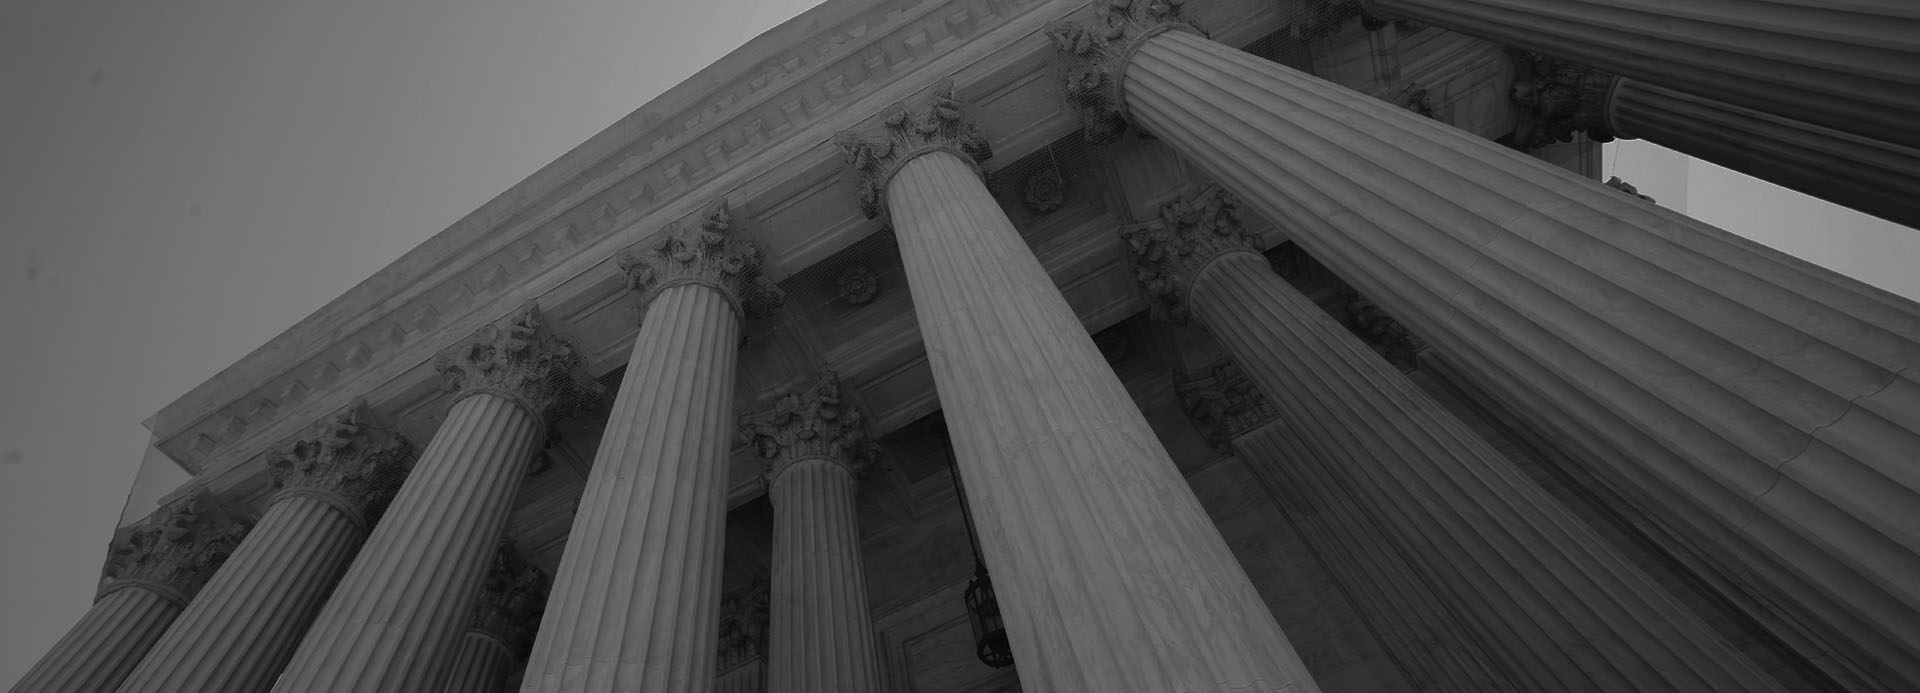 Supreme Courthouse columns